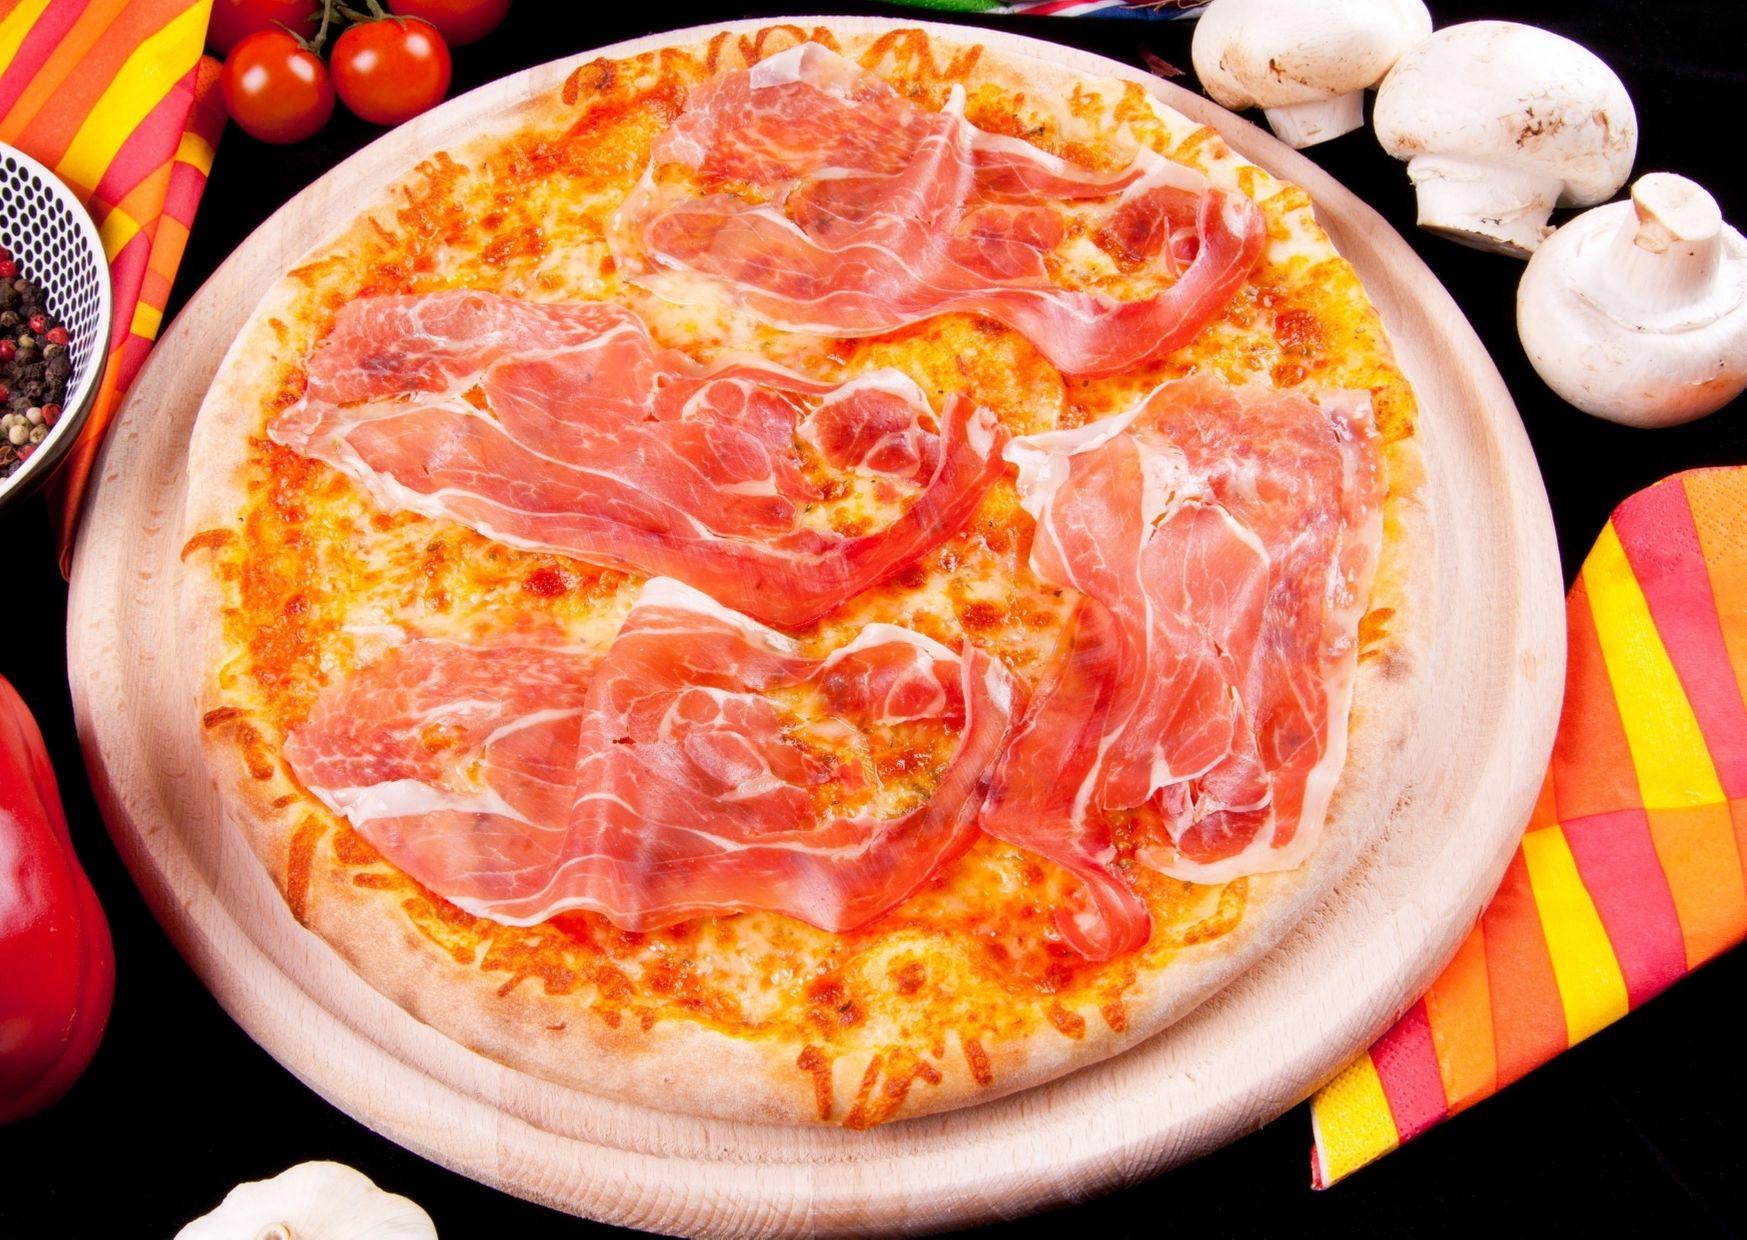 Pizza crocante de jamón crudo y queso provolone